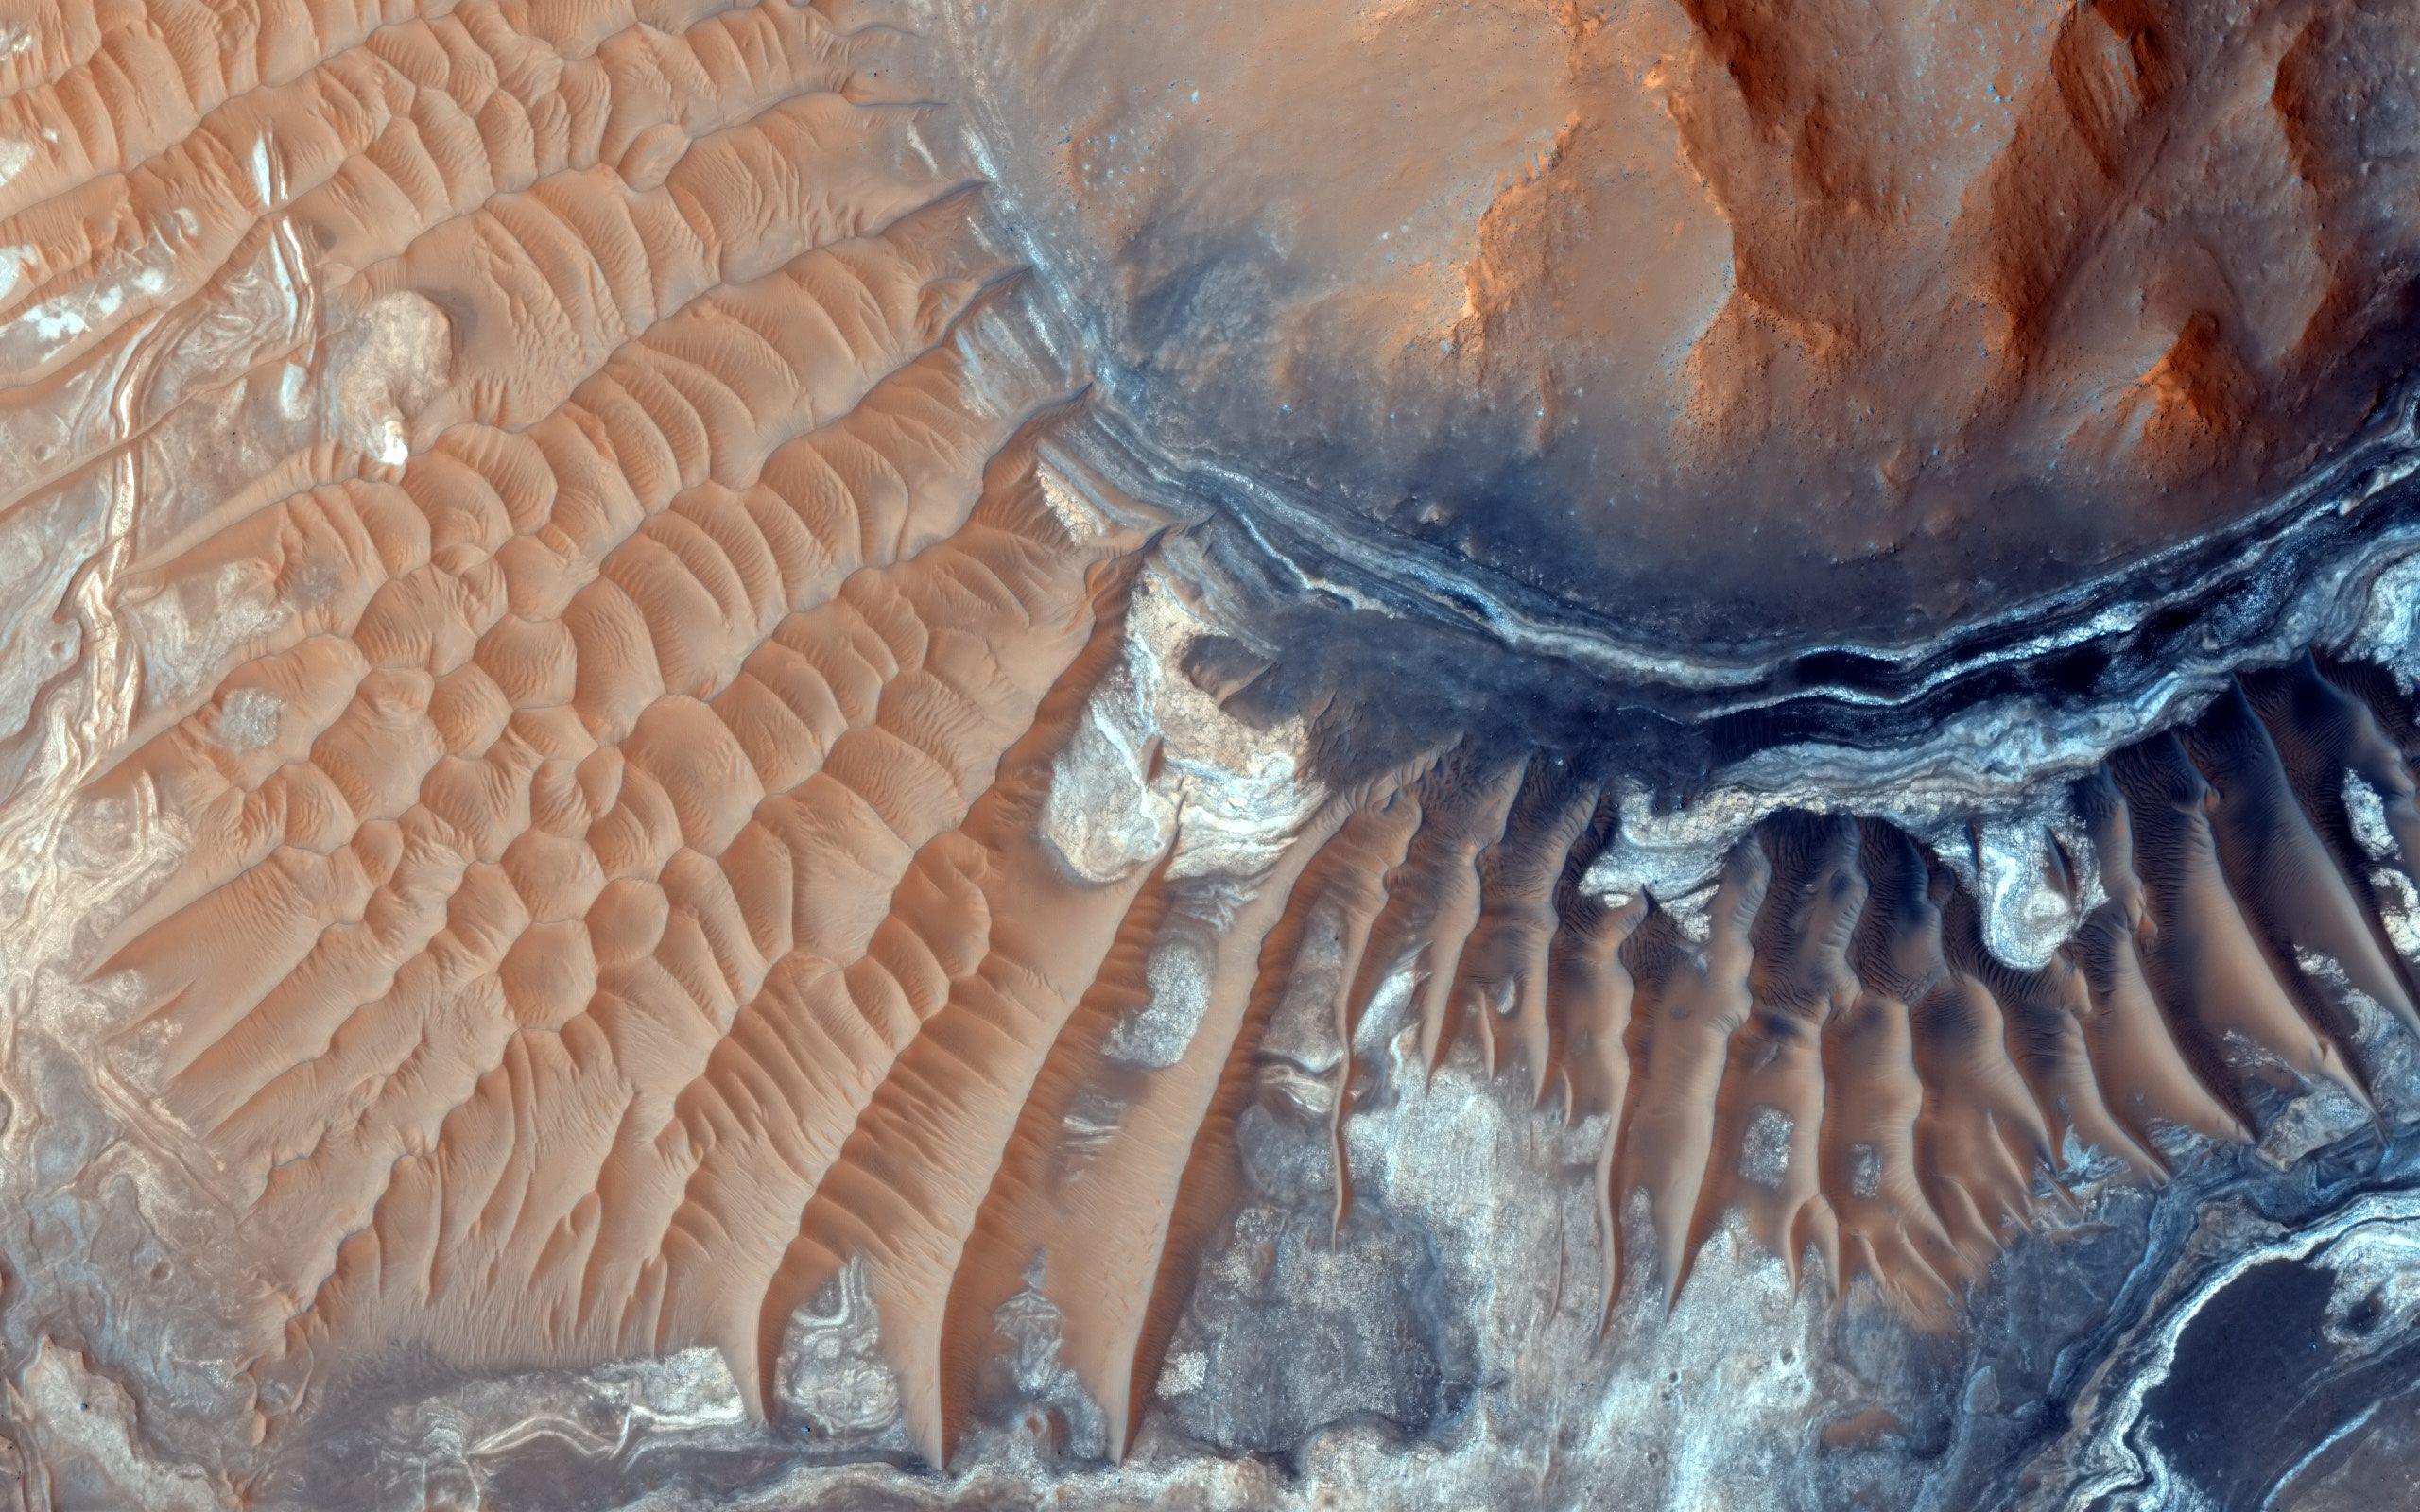 Noctis Labyrinthus - Wikipedia